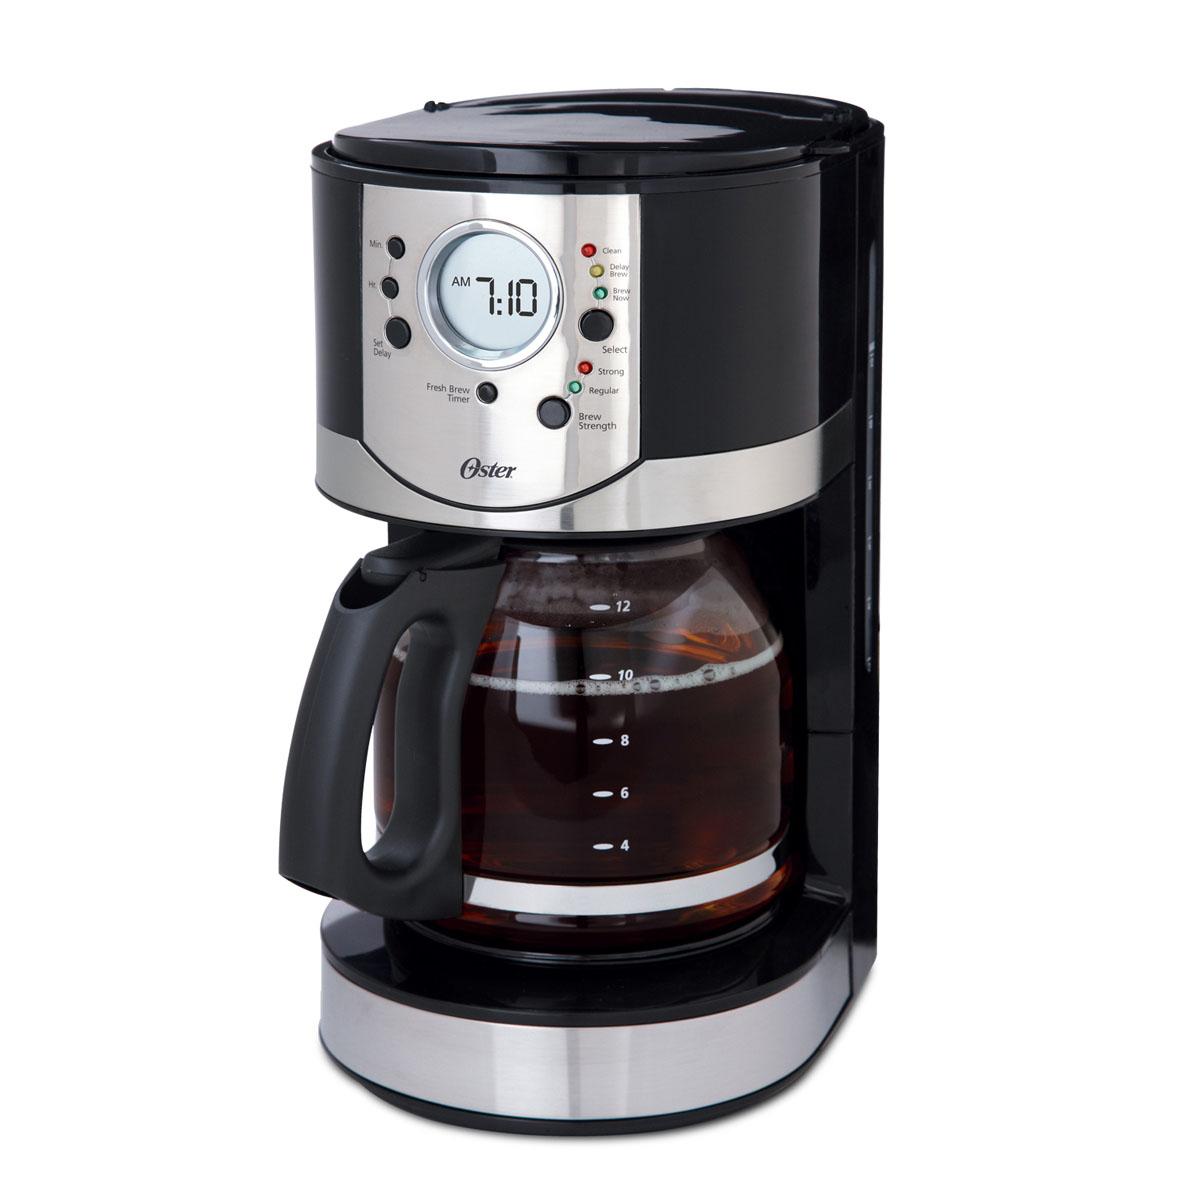 Oster 12 Cup Programmable Coffee Maker Bvstcj0027 033